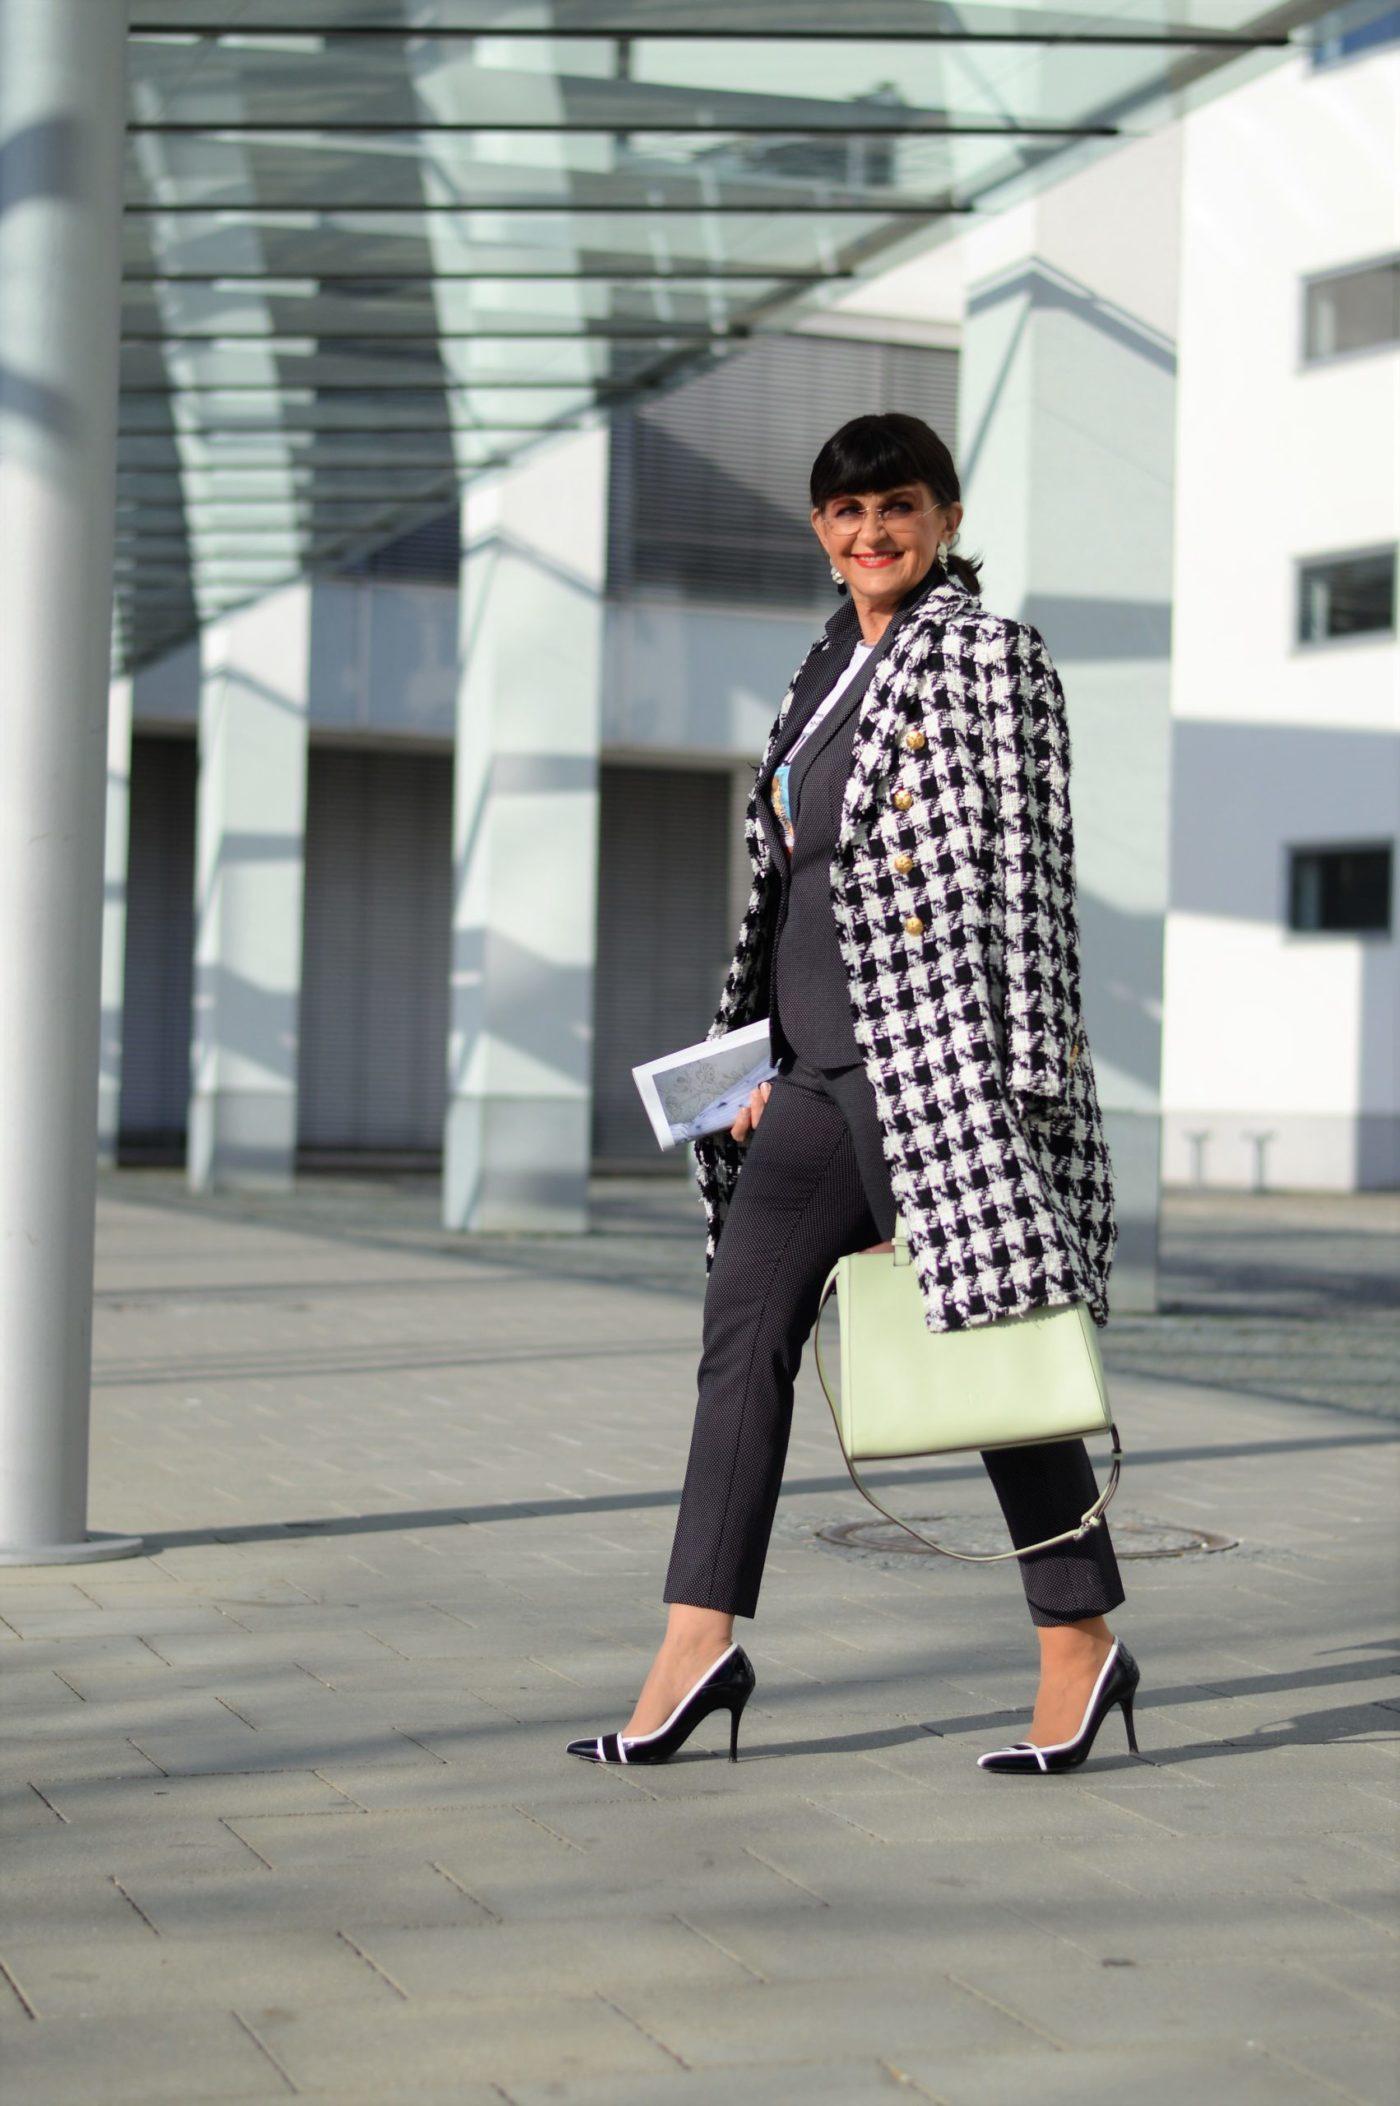 DER HOSENANZUG 8 Styling Tipps Martina Berg Lady 50plus